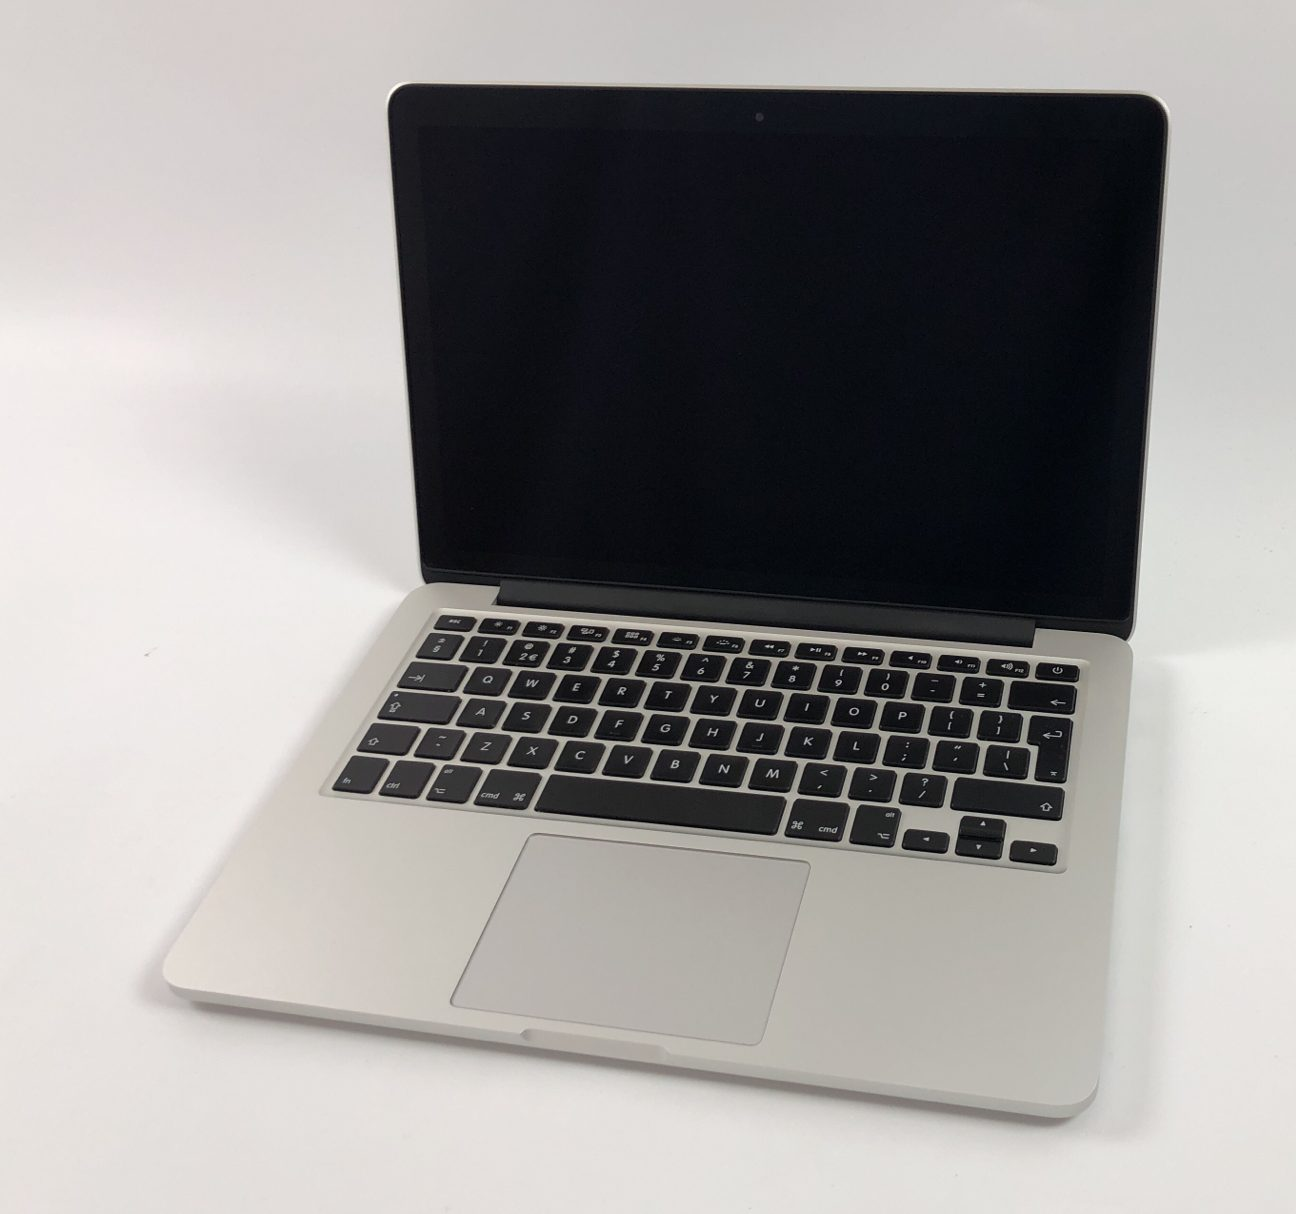 "MacBook Pro Retina 13"" Early 2015 (Intel Core i5 2.7 GHz 8 GB RAM 128 GB SSD), Intel Core i5 2.7 GHz, 8 GB RAM, 128 GB SSD, Afbeelding 1"